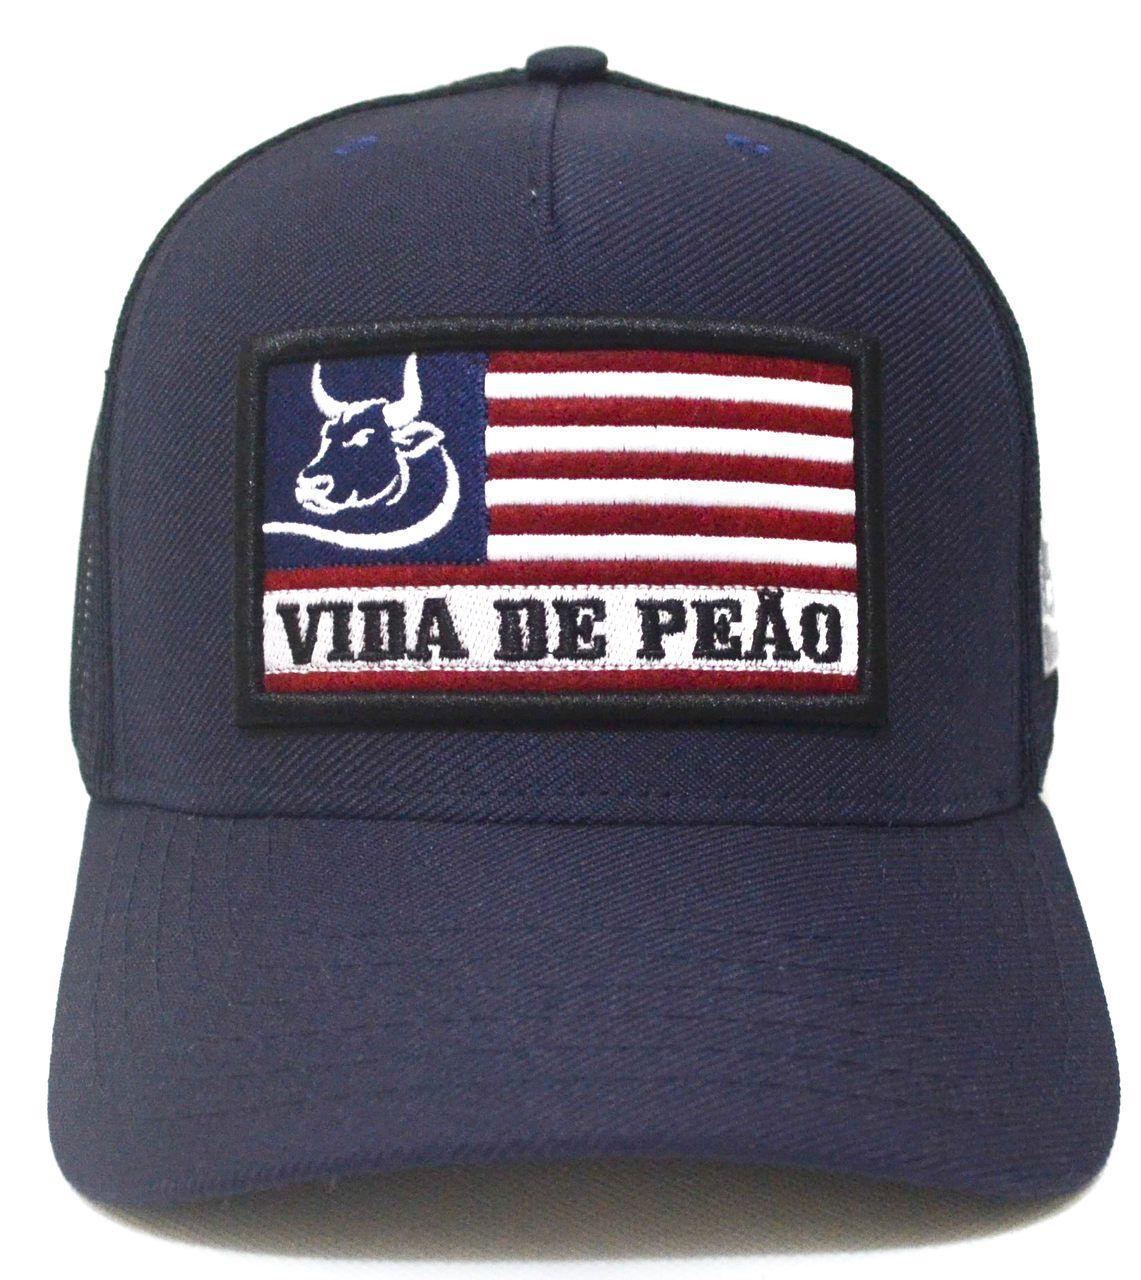 bafff763d6c49 Boné Country Vida De Peão Azul Aba Curva Feminino Masculino Trucker Tela